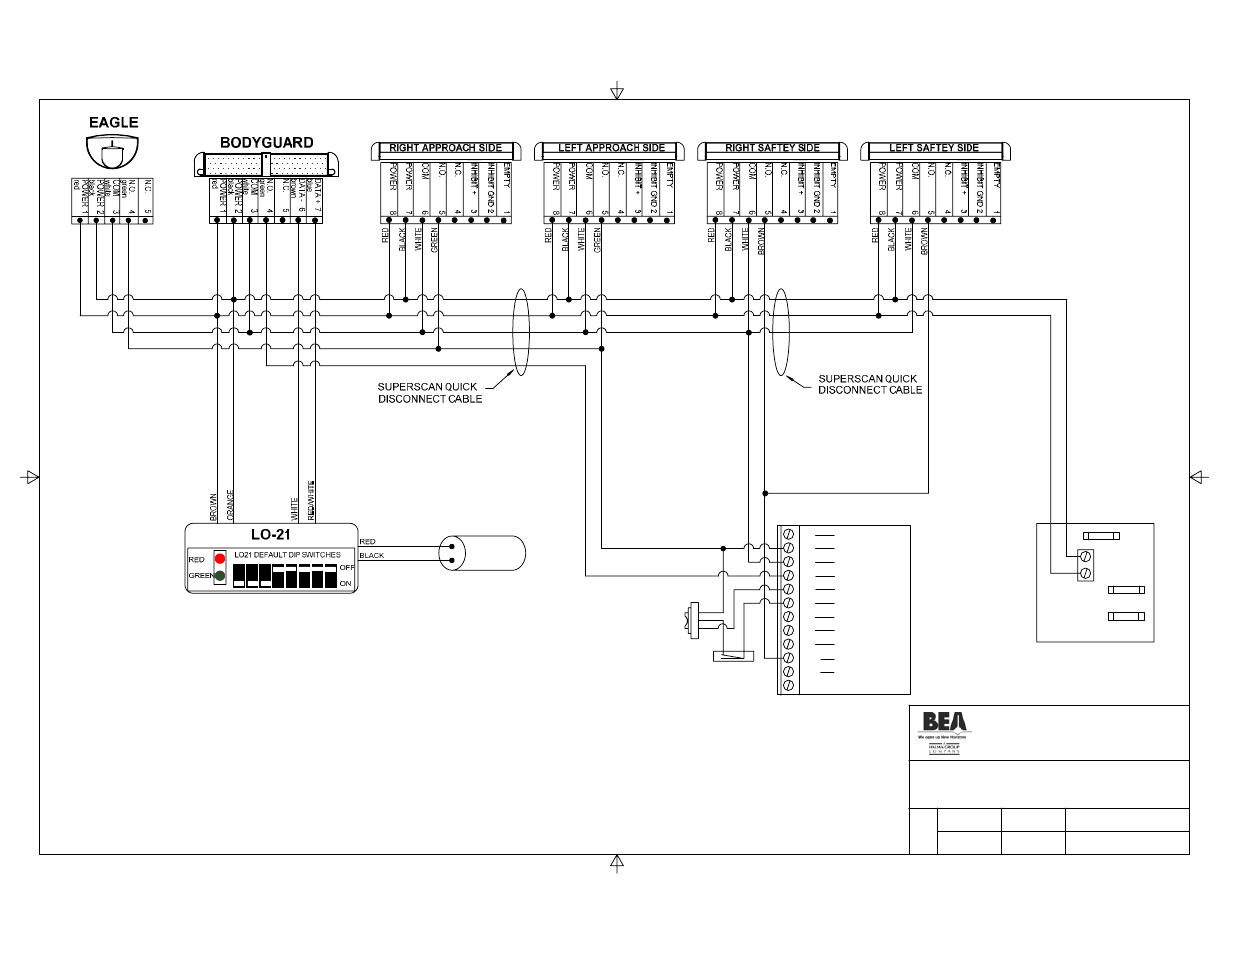 pac 80 wiring diagram 2002 nissan xterra speaker c2r diagrams pin